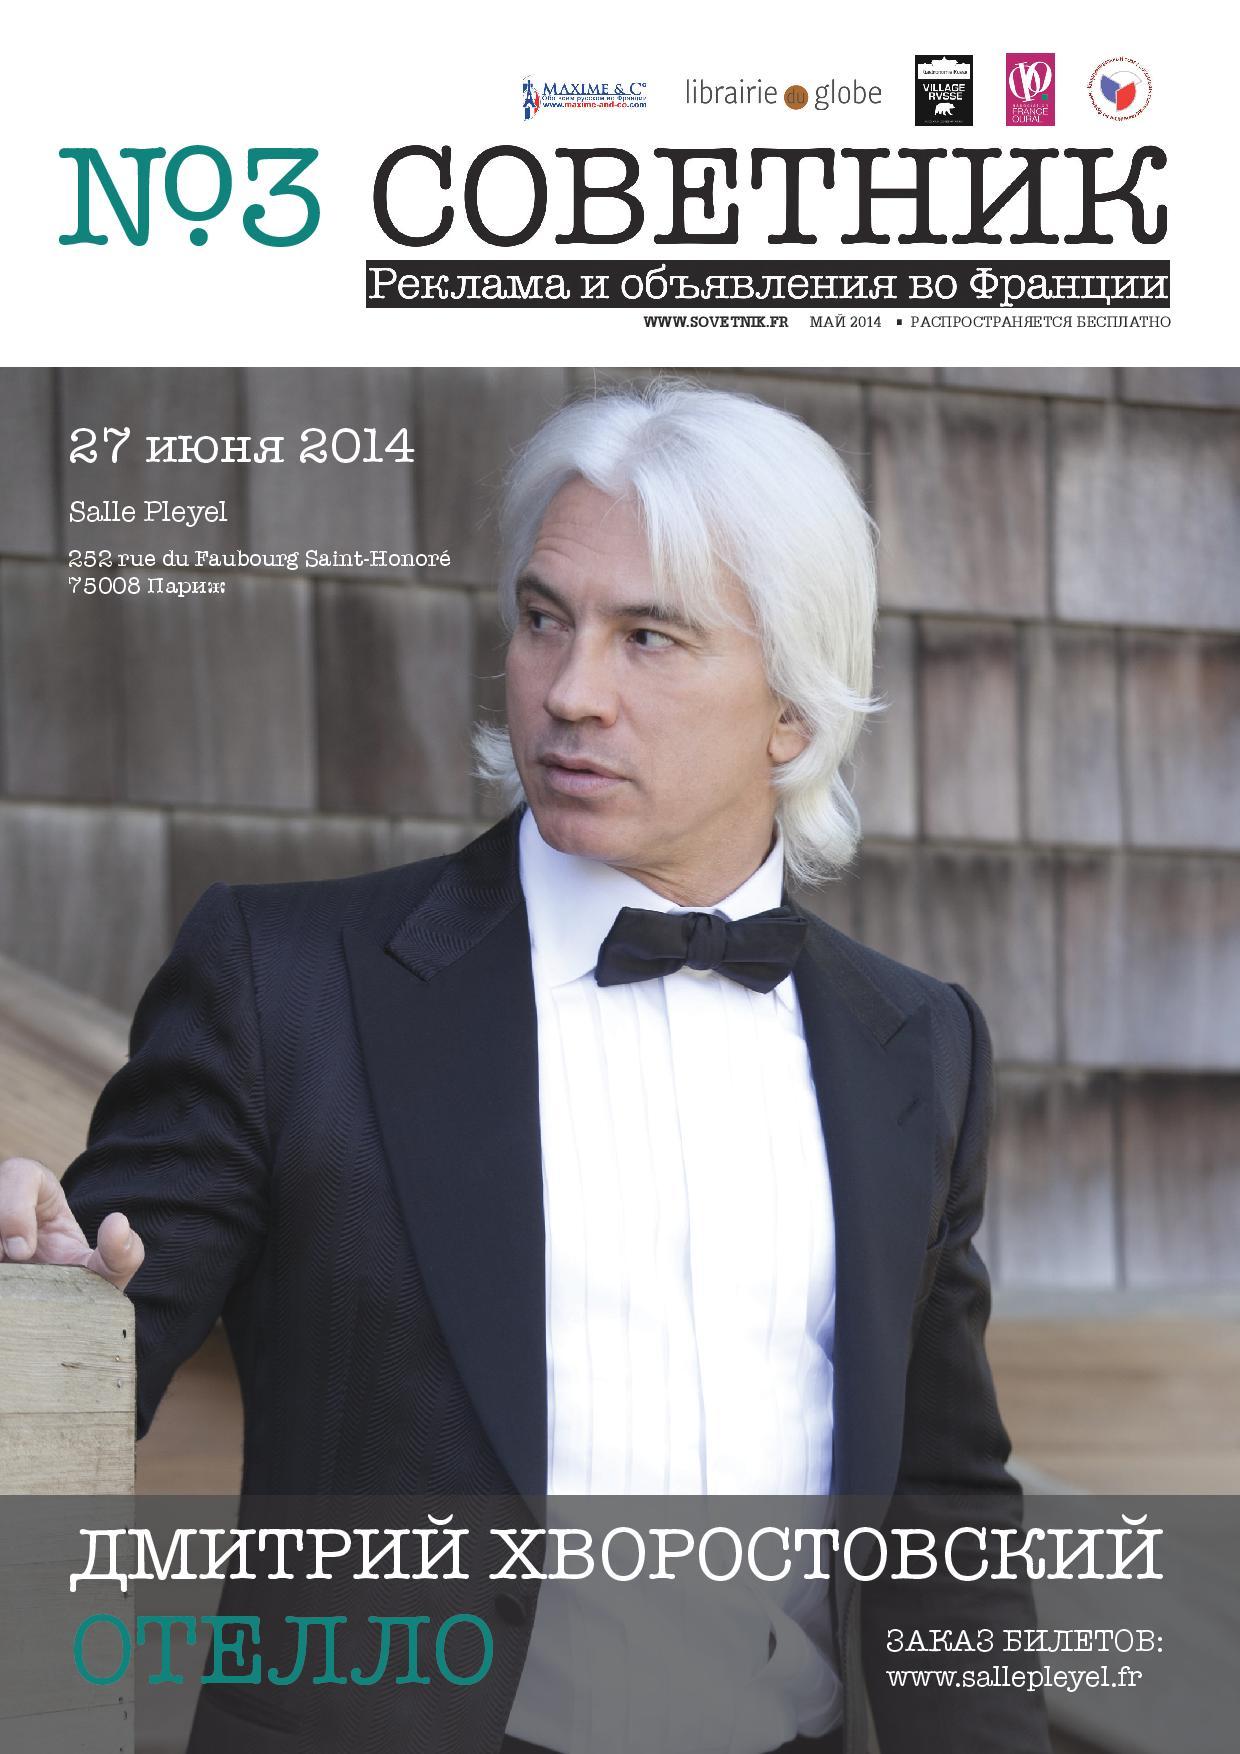 Советник, май 2014 (№3)